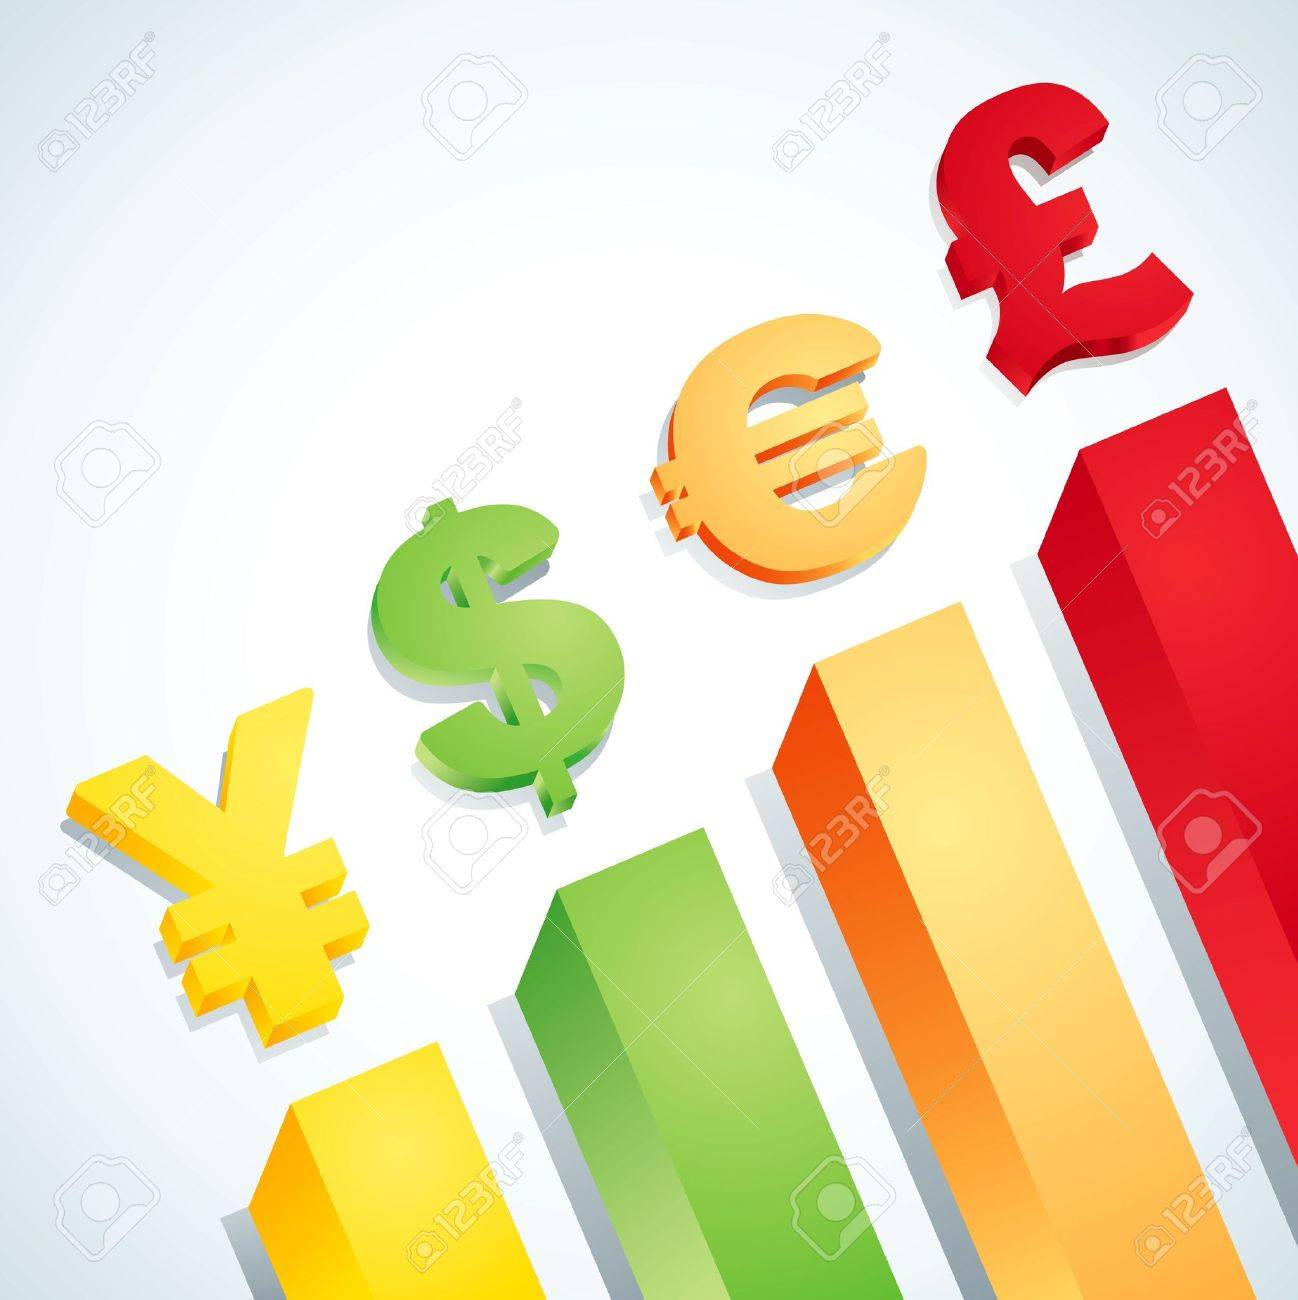 Symbols of dollar, euro, pound and yen Stock Vector - 9355490